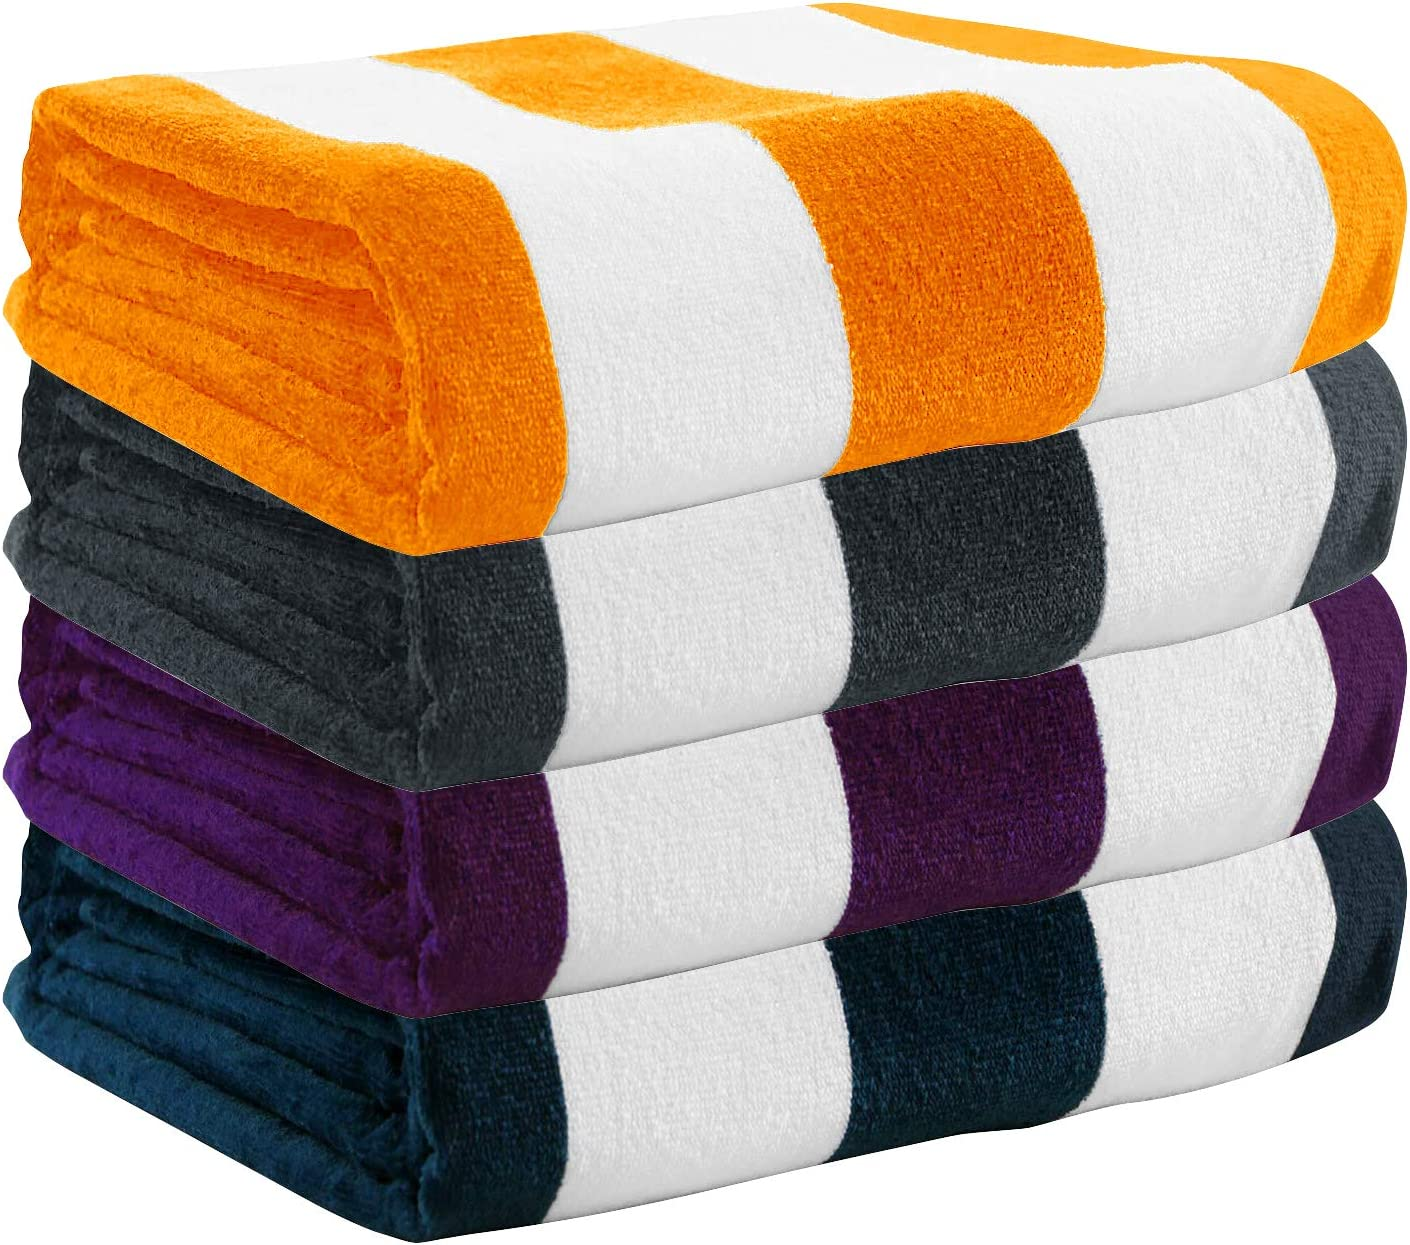 Exclusivo Mezcla Extra Large Beach Towels